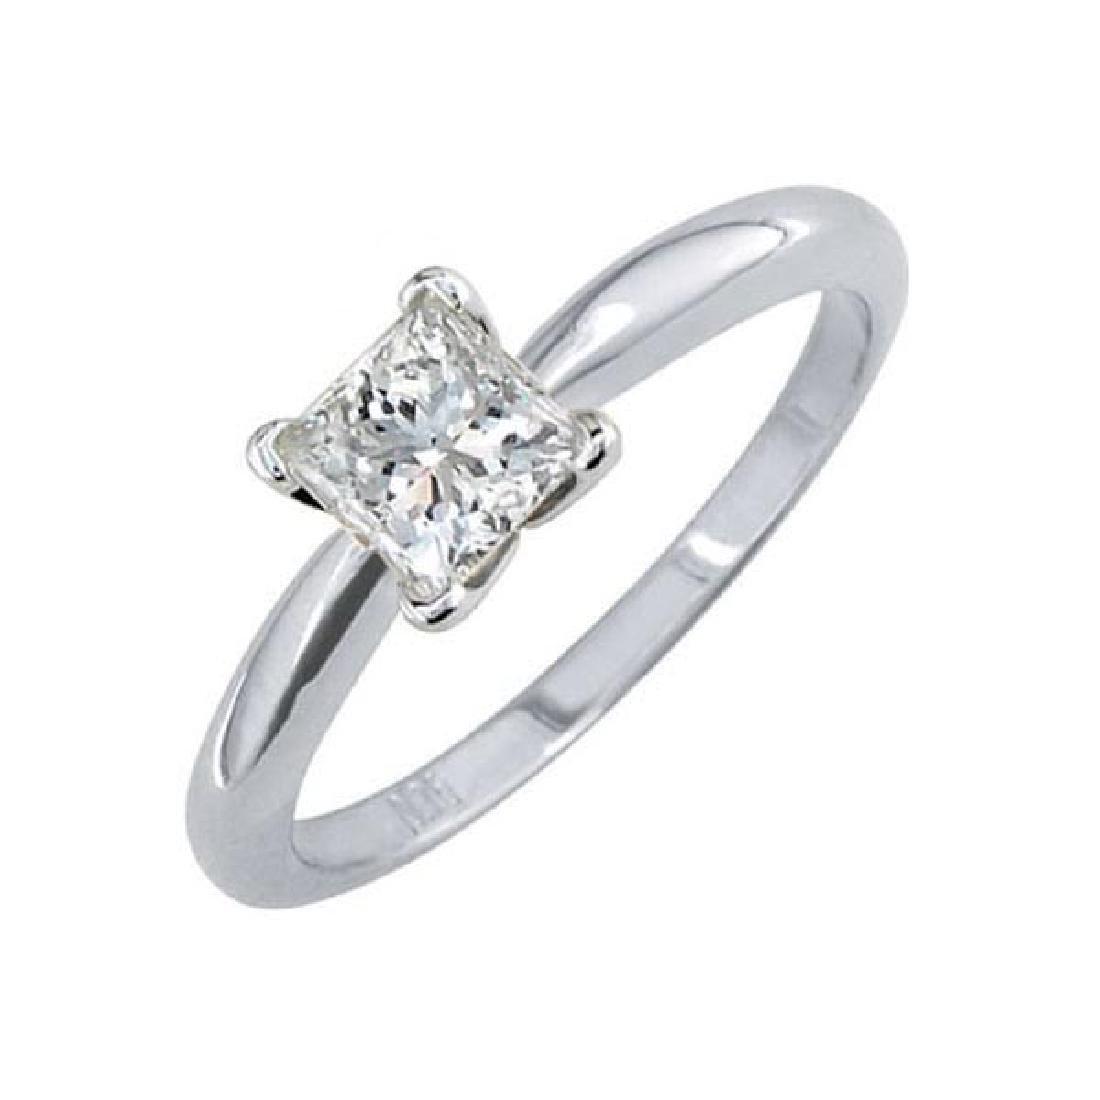 Certified 1.5 CTW Princess Diamond Solitaire 14k Ring G